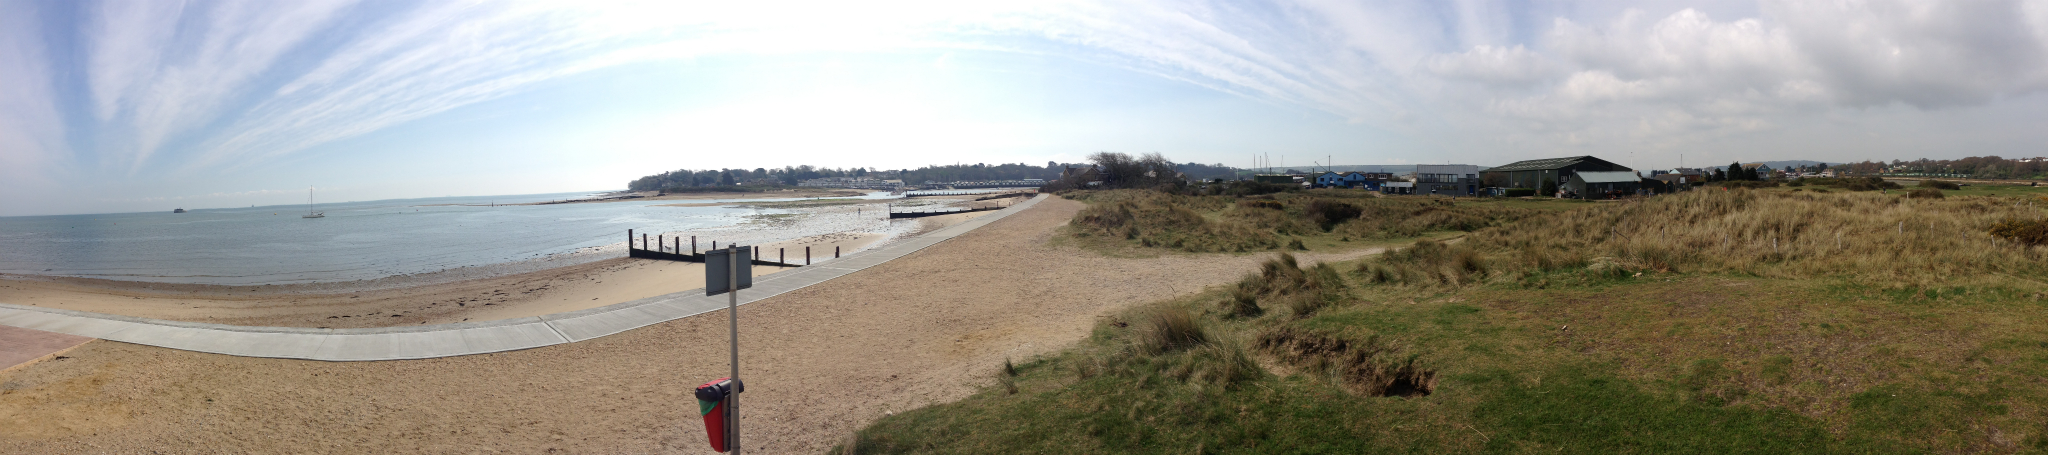 Panoramic view of the beach at Bembridge